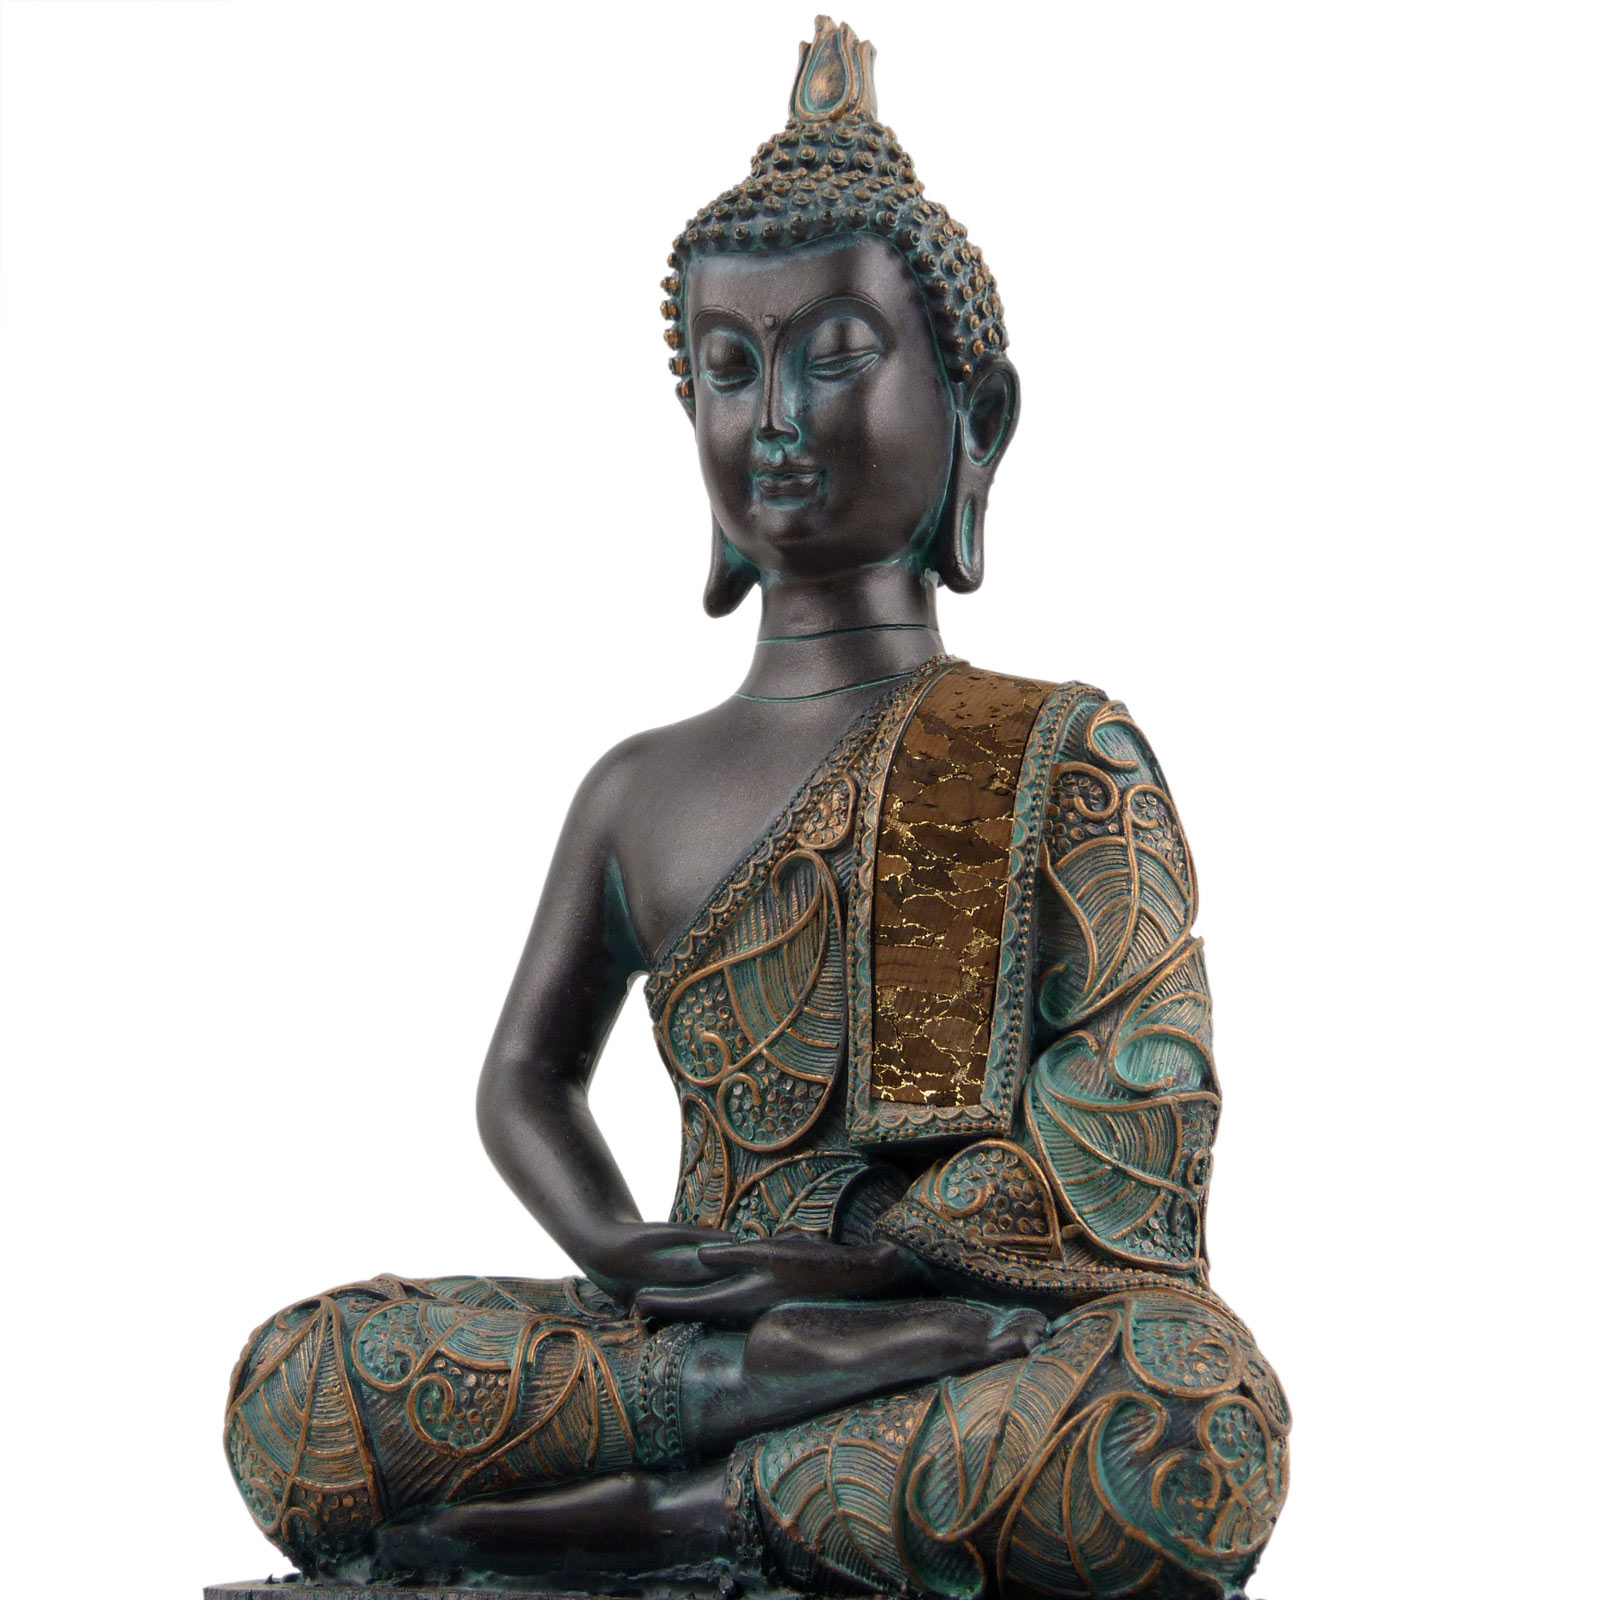 Verdin-Buda-Tailandes-23cm-Alto-4-Disenos-Meditacion-Mindfulness-Metta miniatura 3